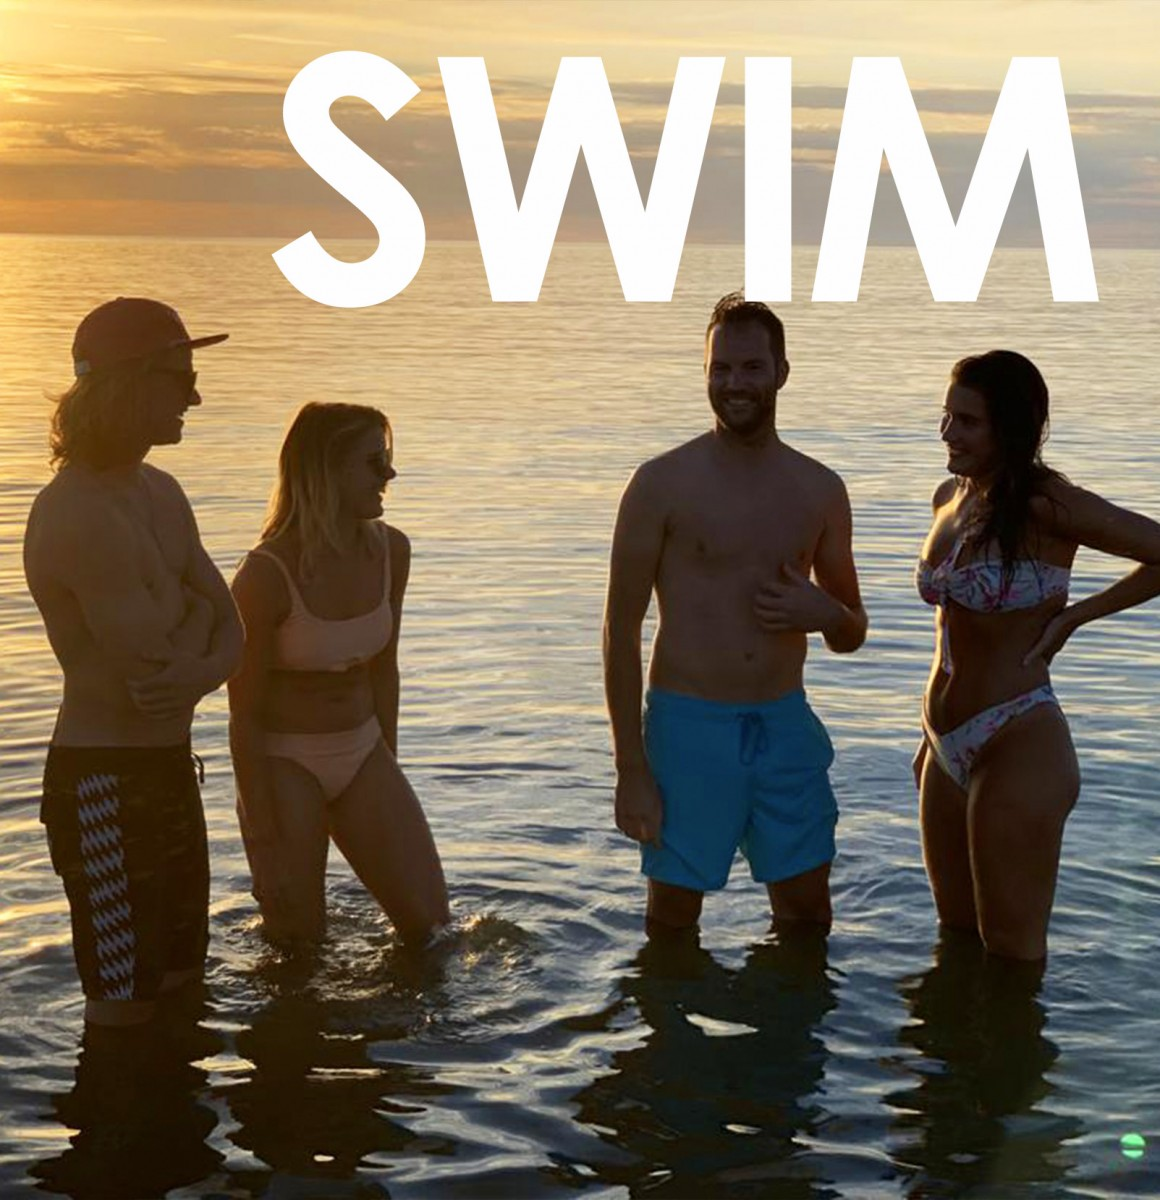 (1) SWIMWEAR MOANA SIX - billabong swimwear, boardshort, billabong board short, billabong bikini, mila badpak, lentiggini badpak, dames badkleding, heren zwembroeken, kinder zwemkleding, surfshop, brouwershaven